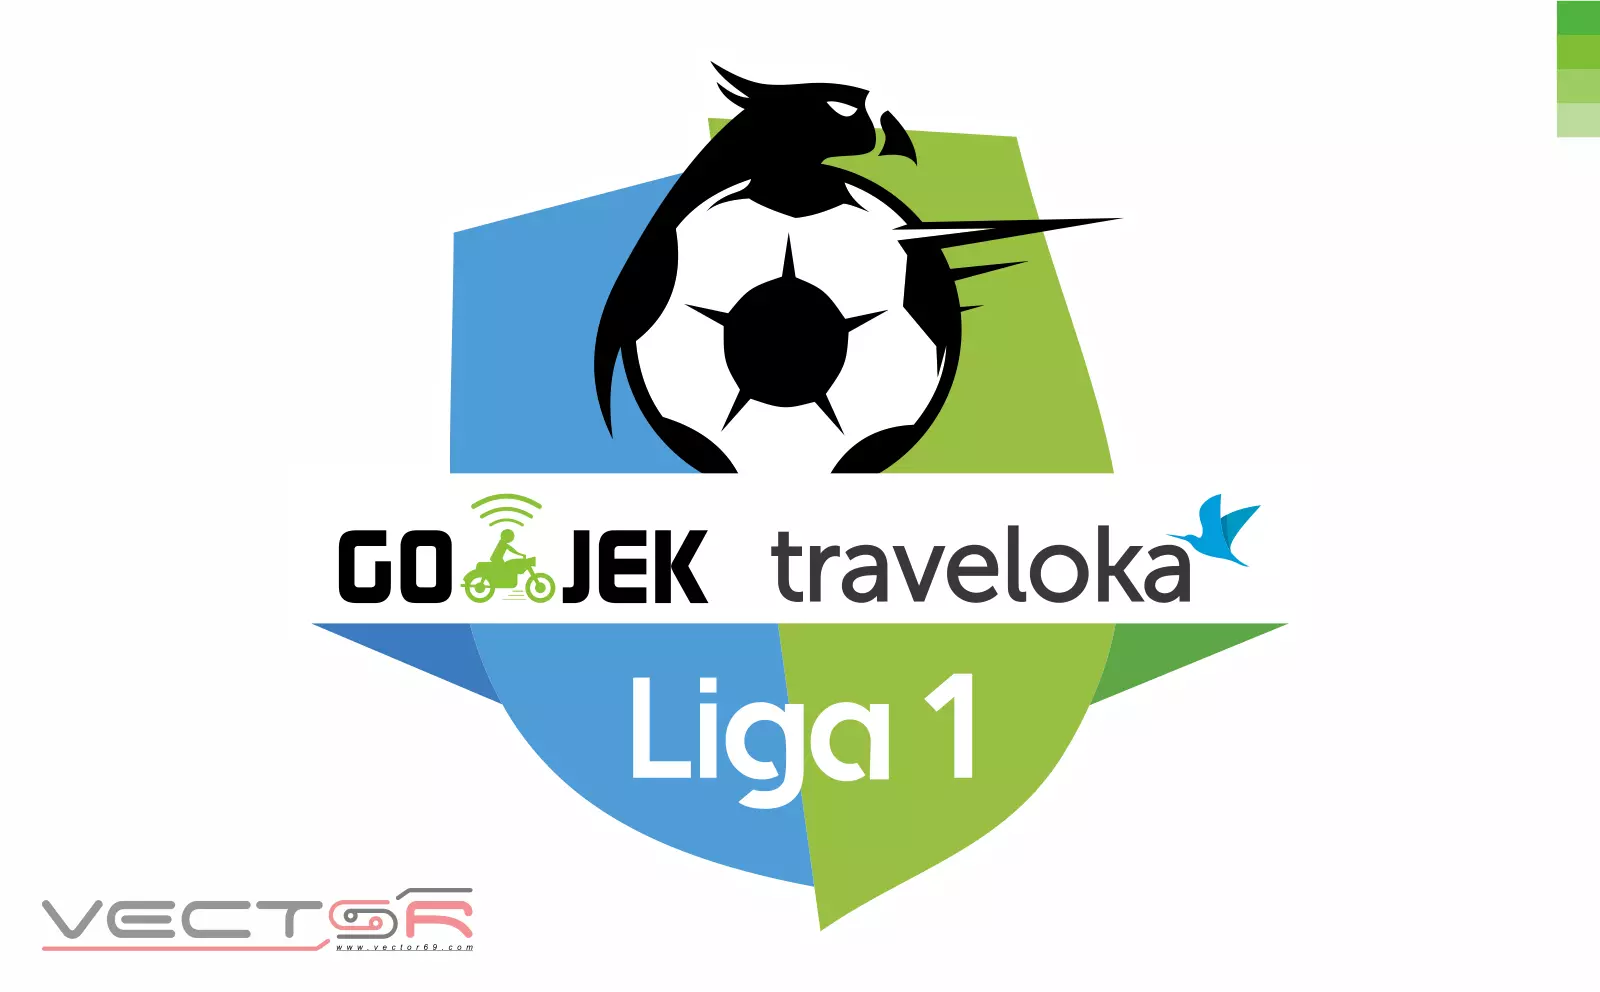 Gojek Traveloka Liga 1 Indonesia Logo - Download Vector File CDR (CorelDraw)